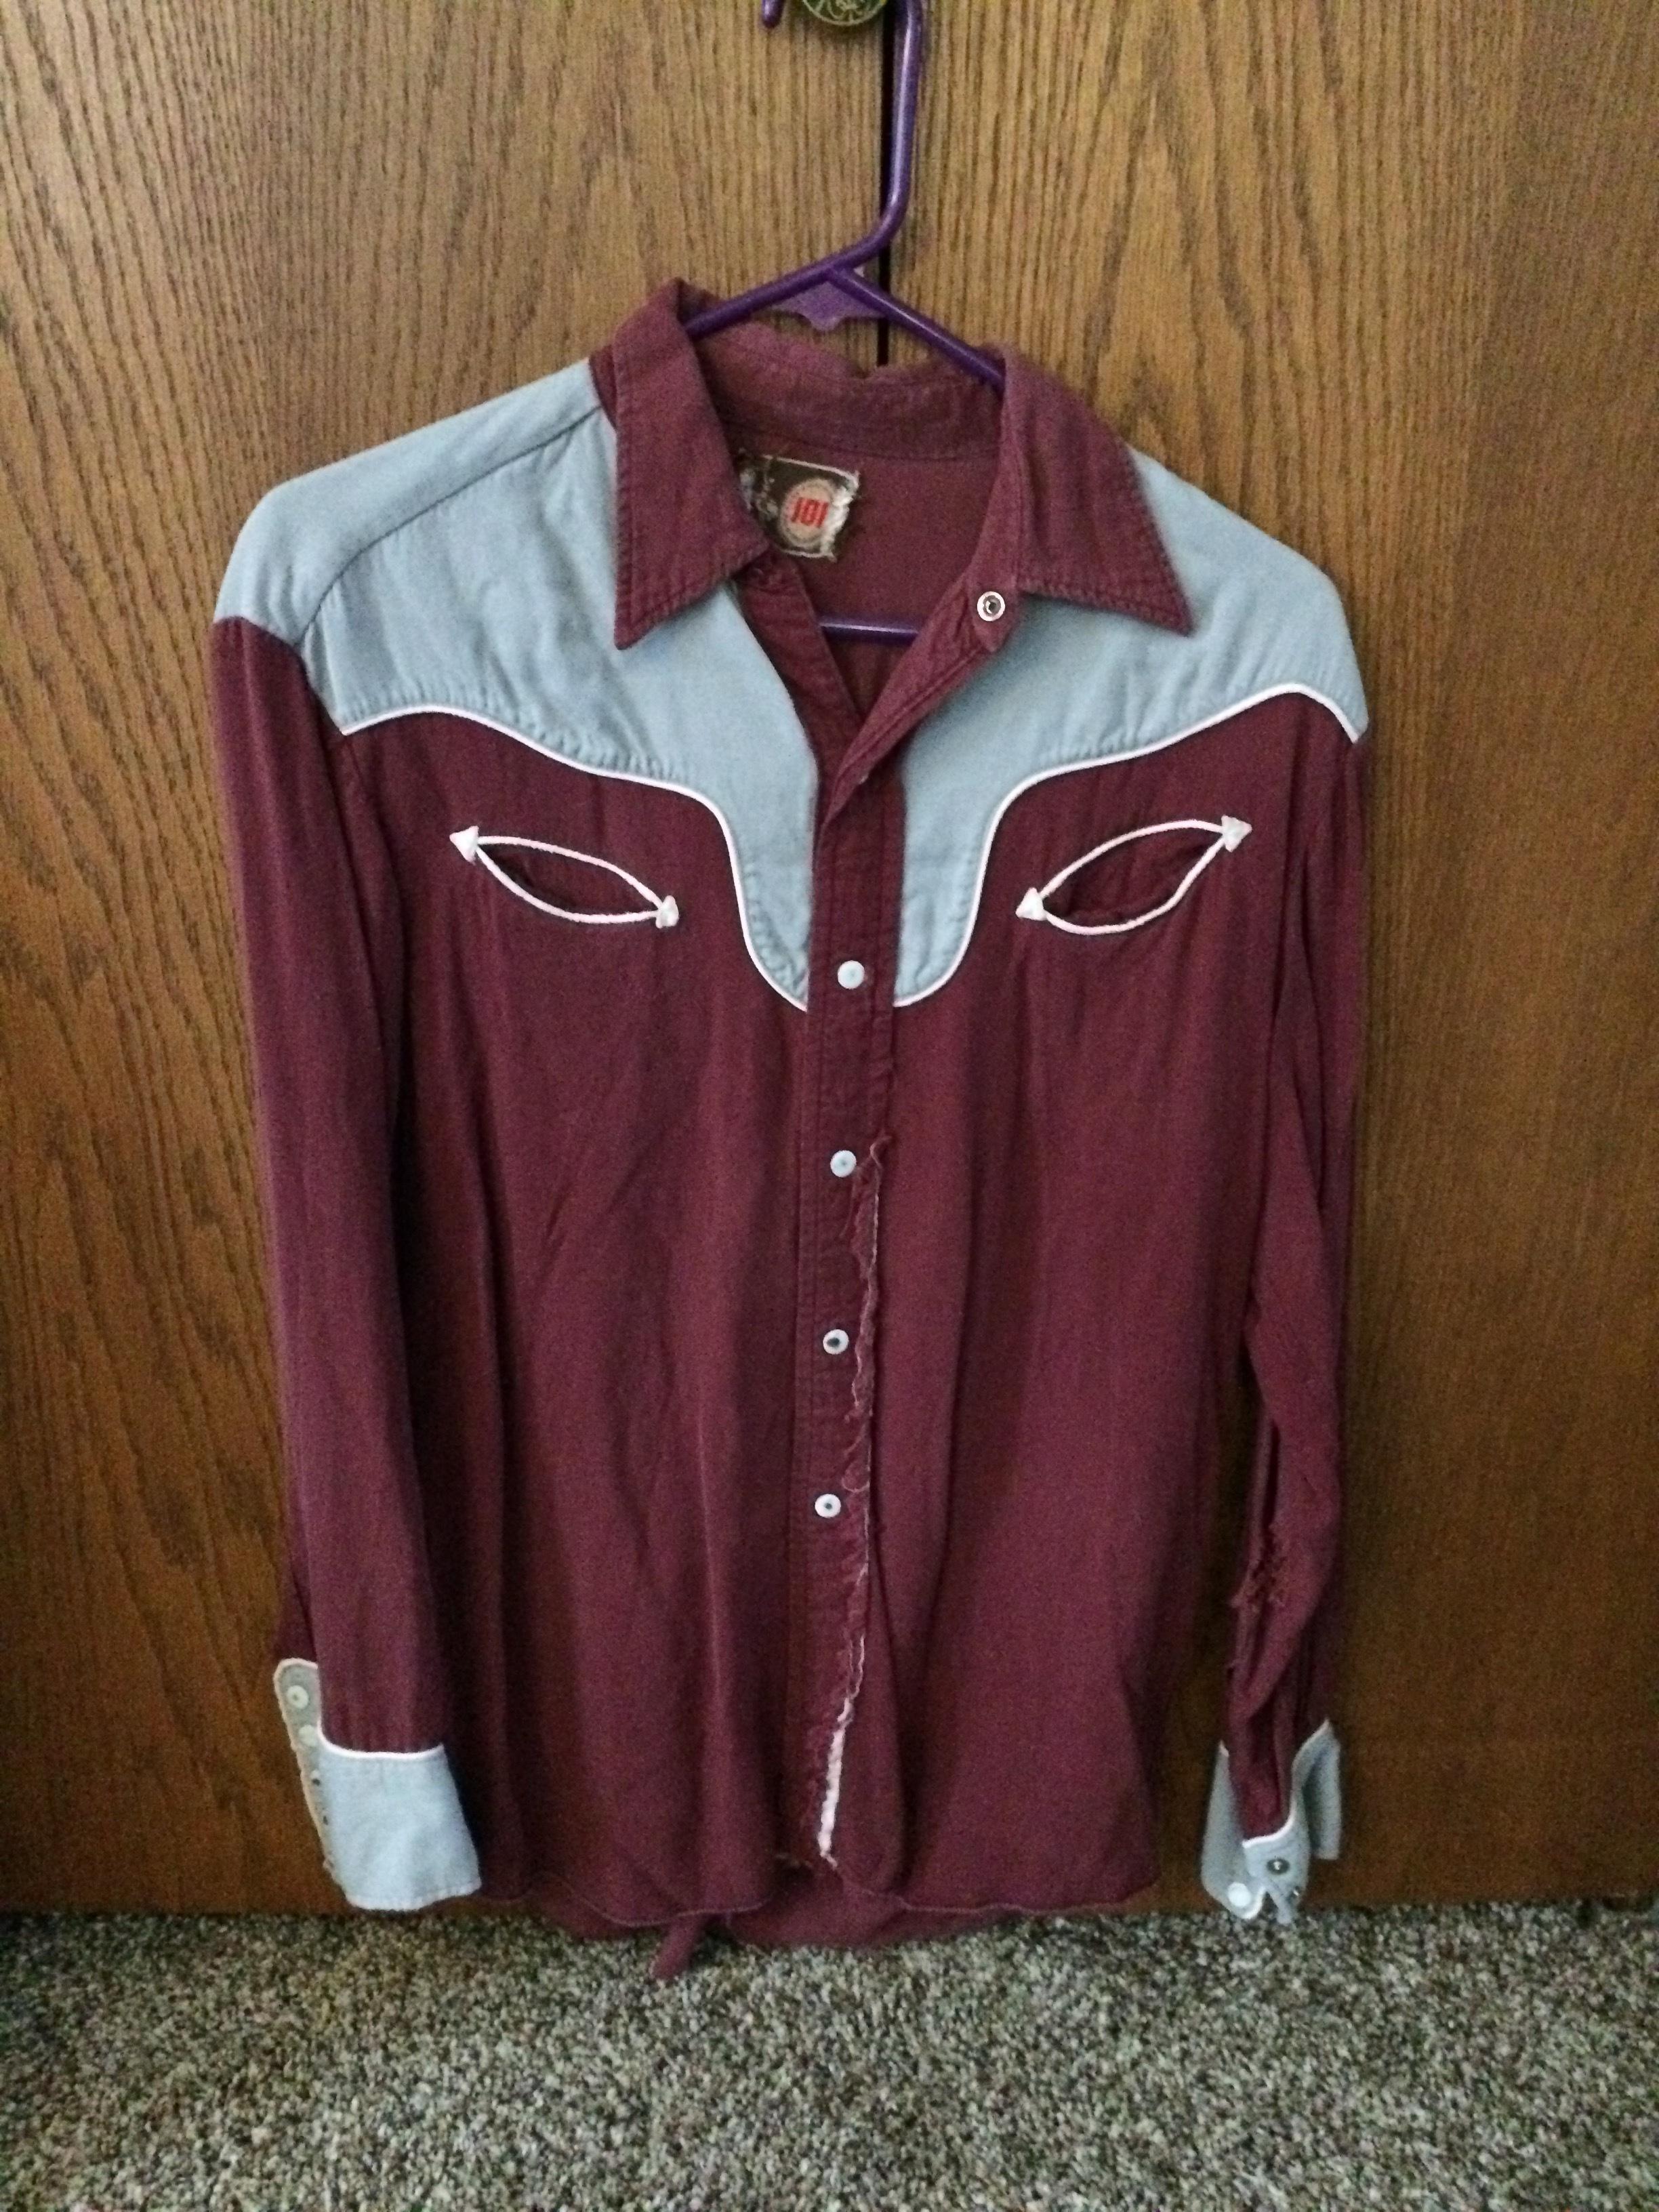 The Cowboy Shirt of Ronnie Owens